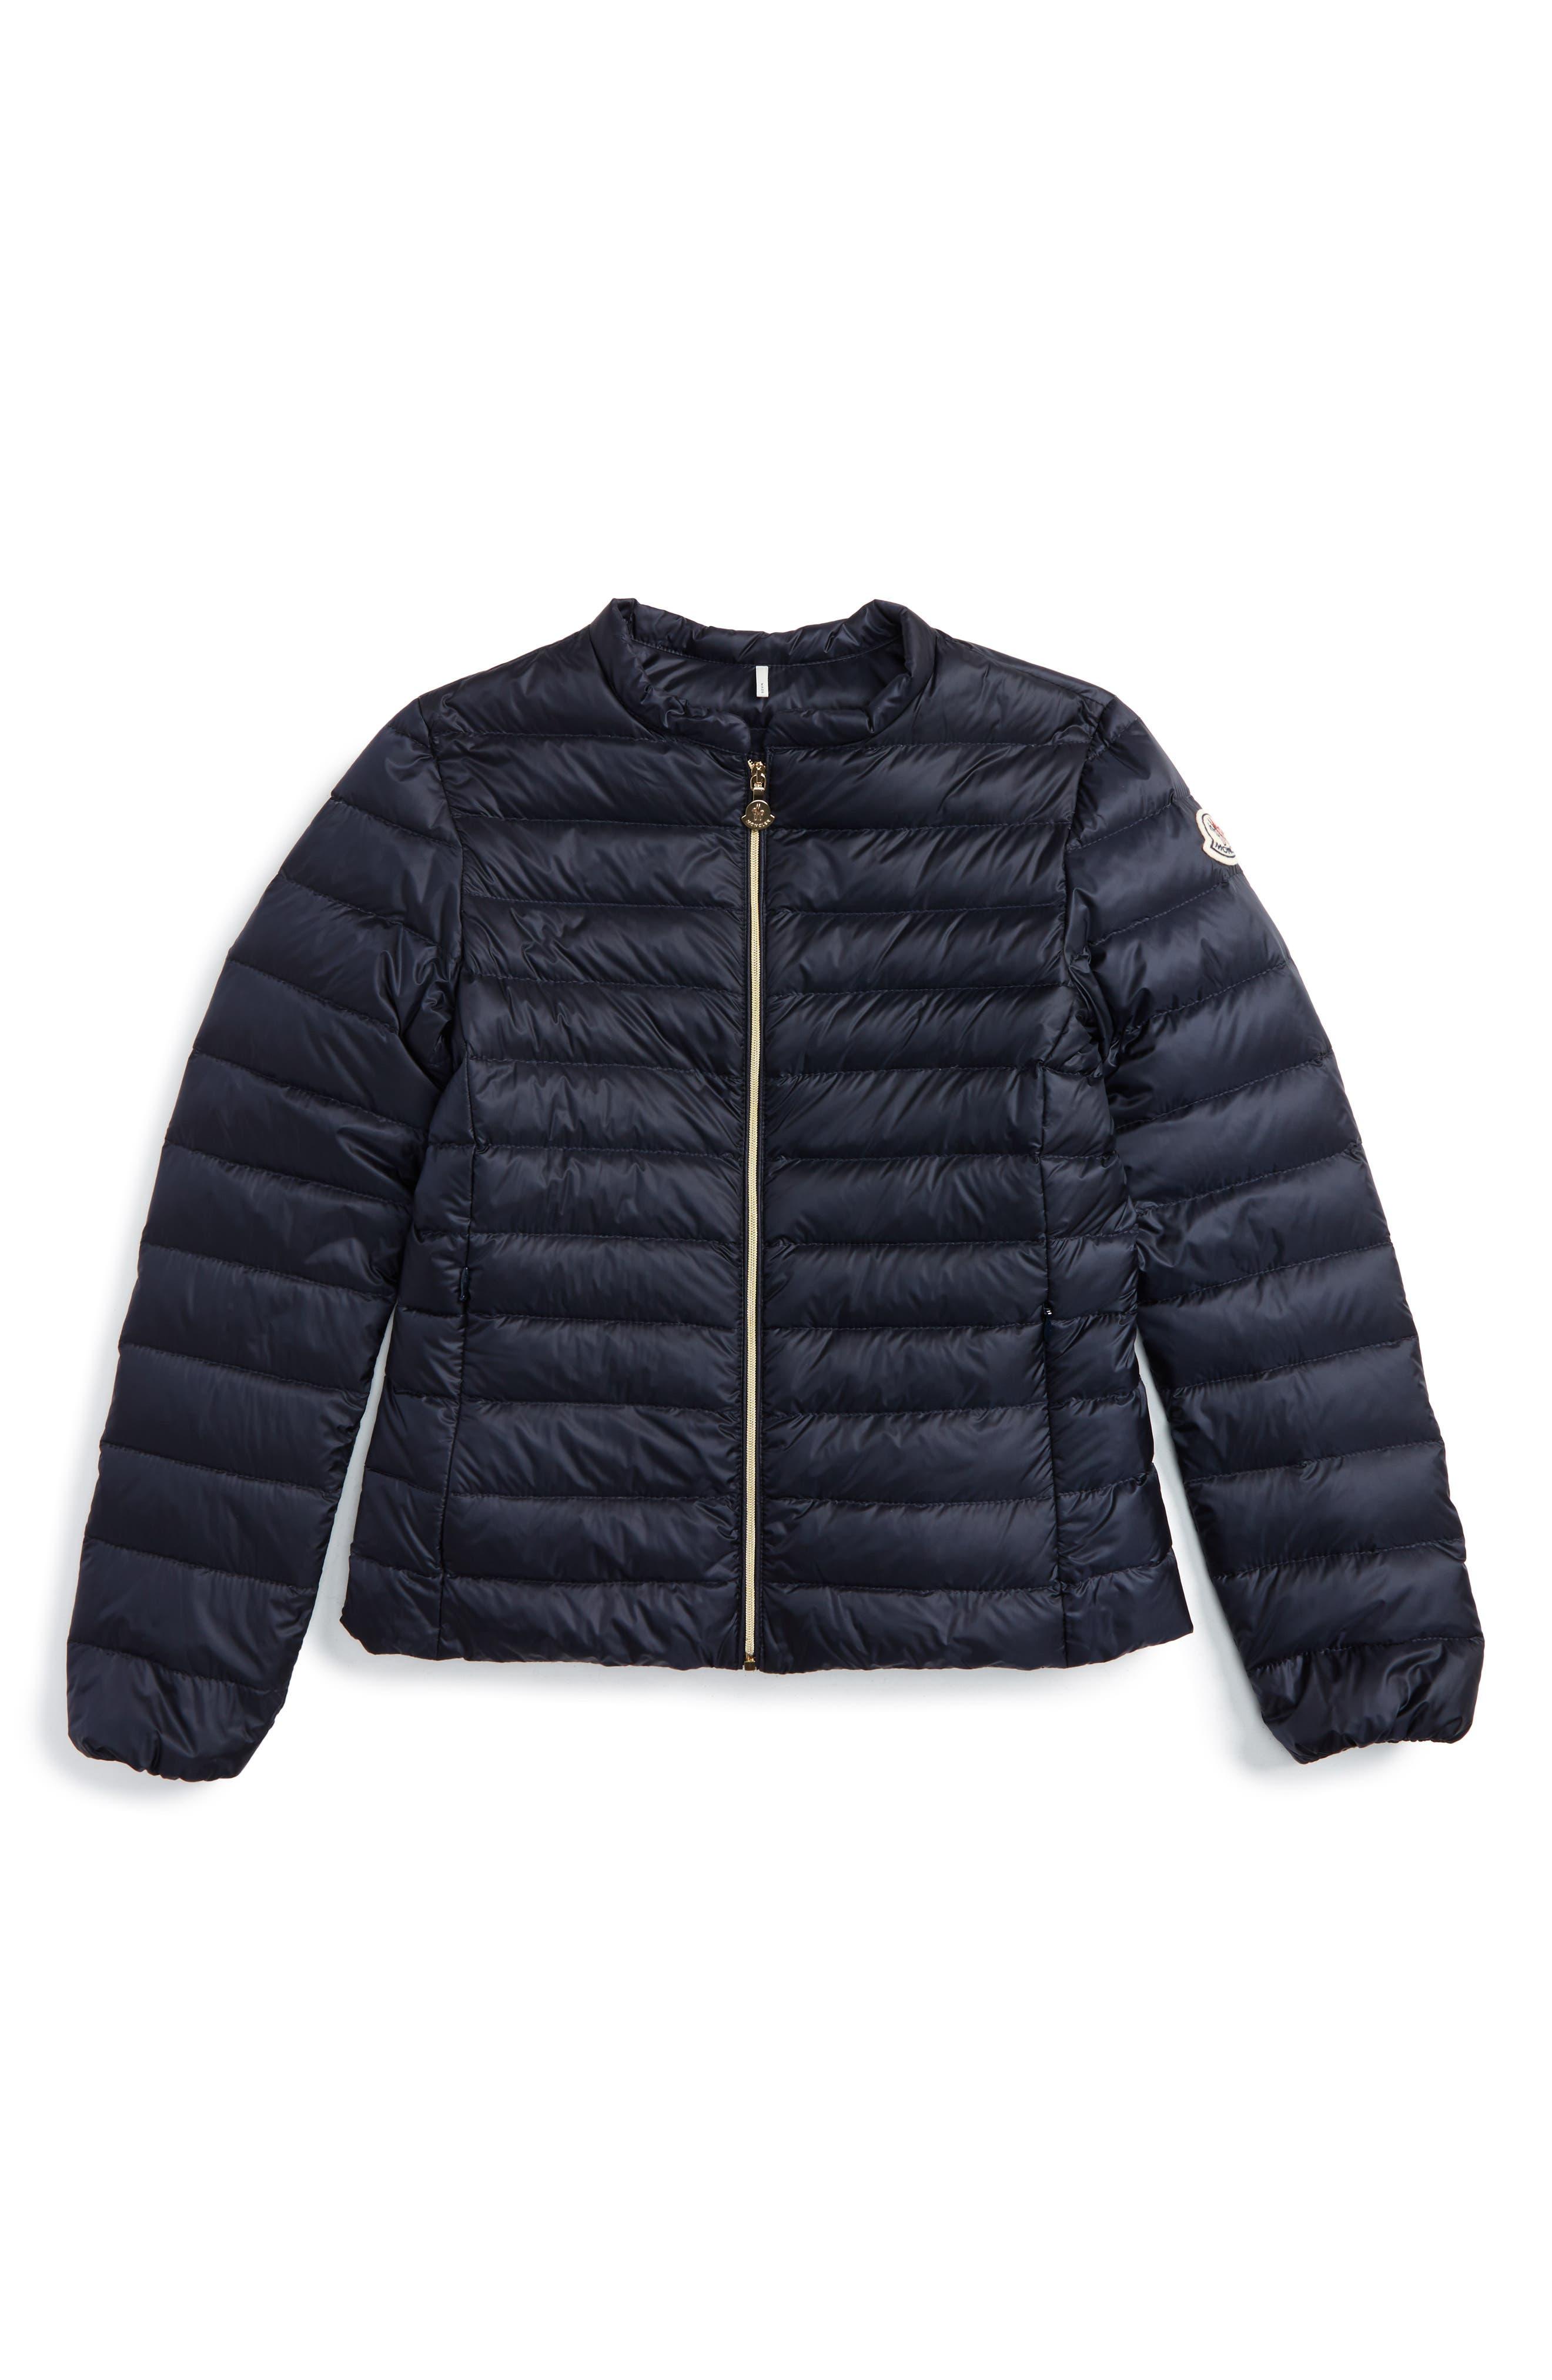 Ambrine Water Resistant Down Jacket,                         Main,                         color, Navy